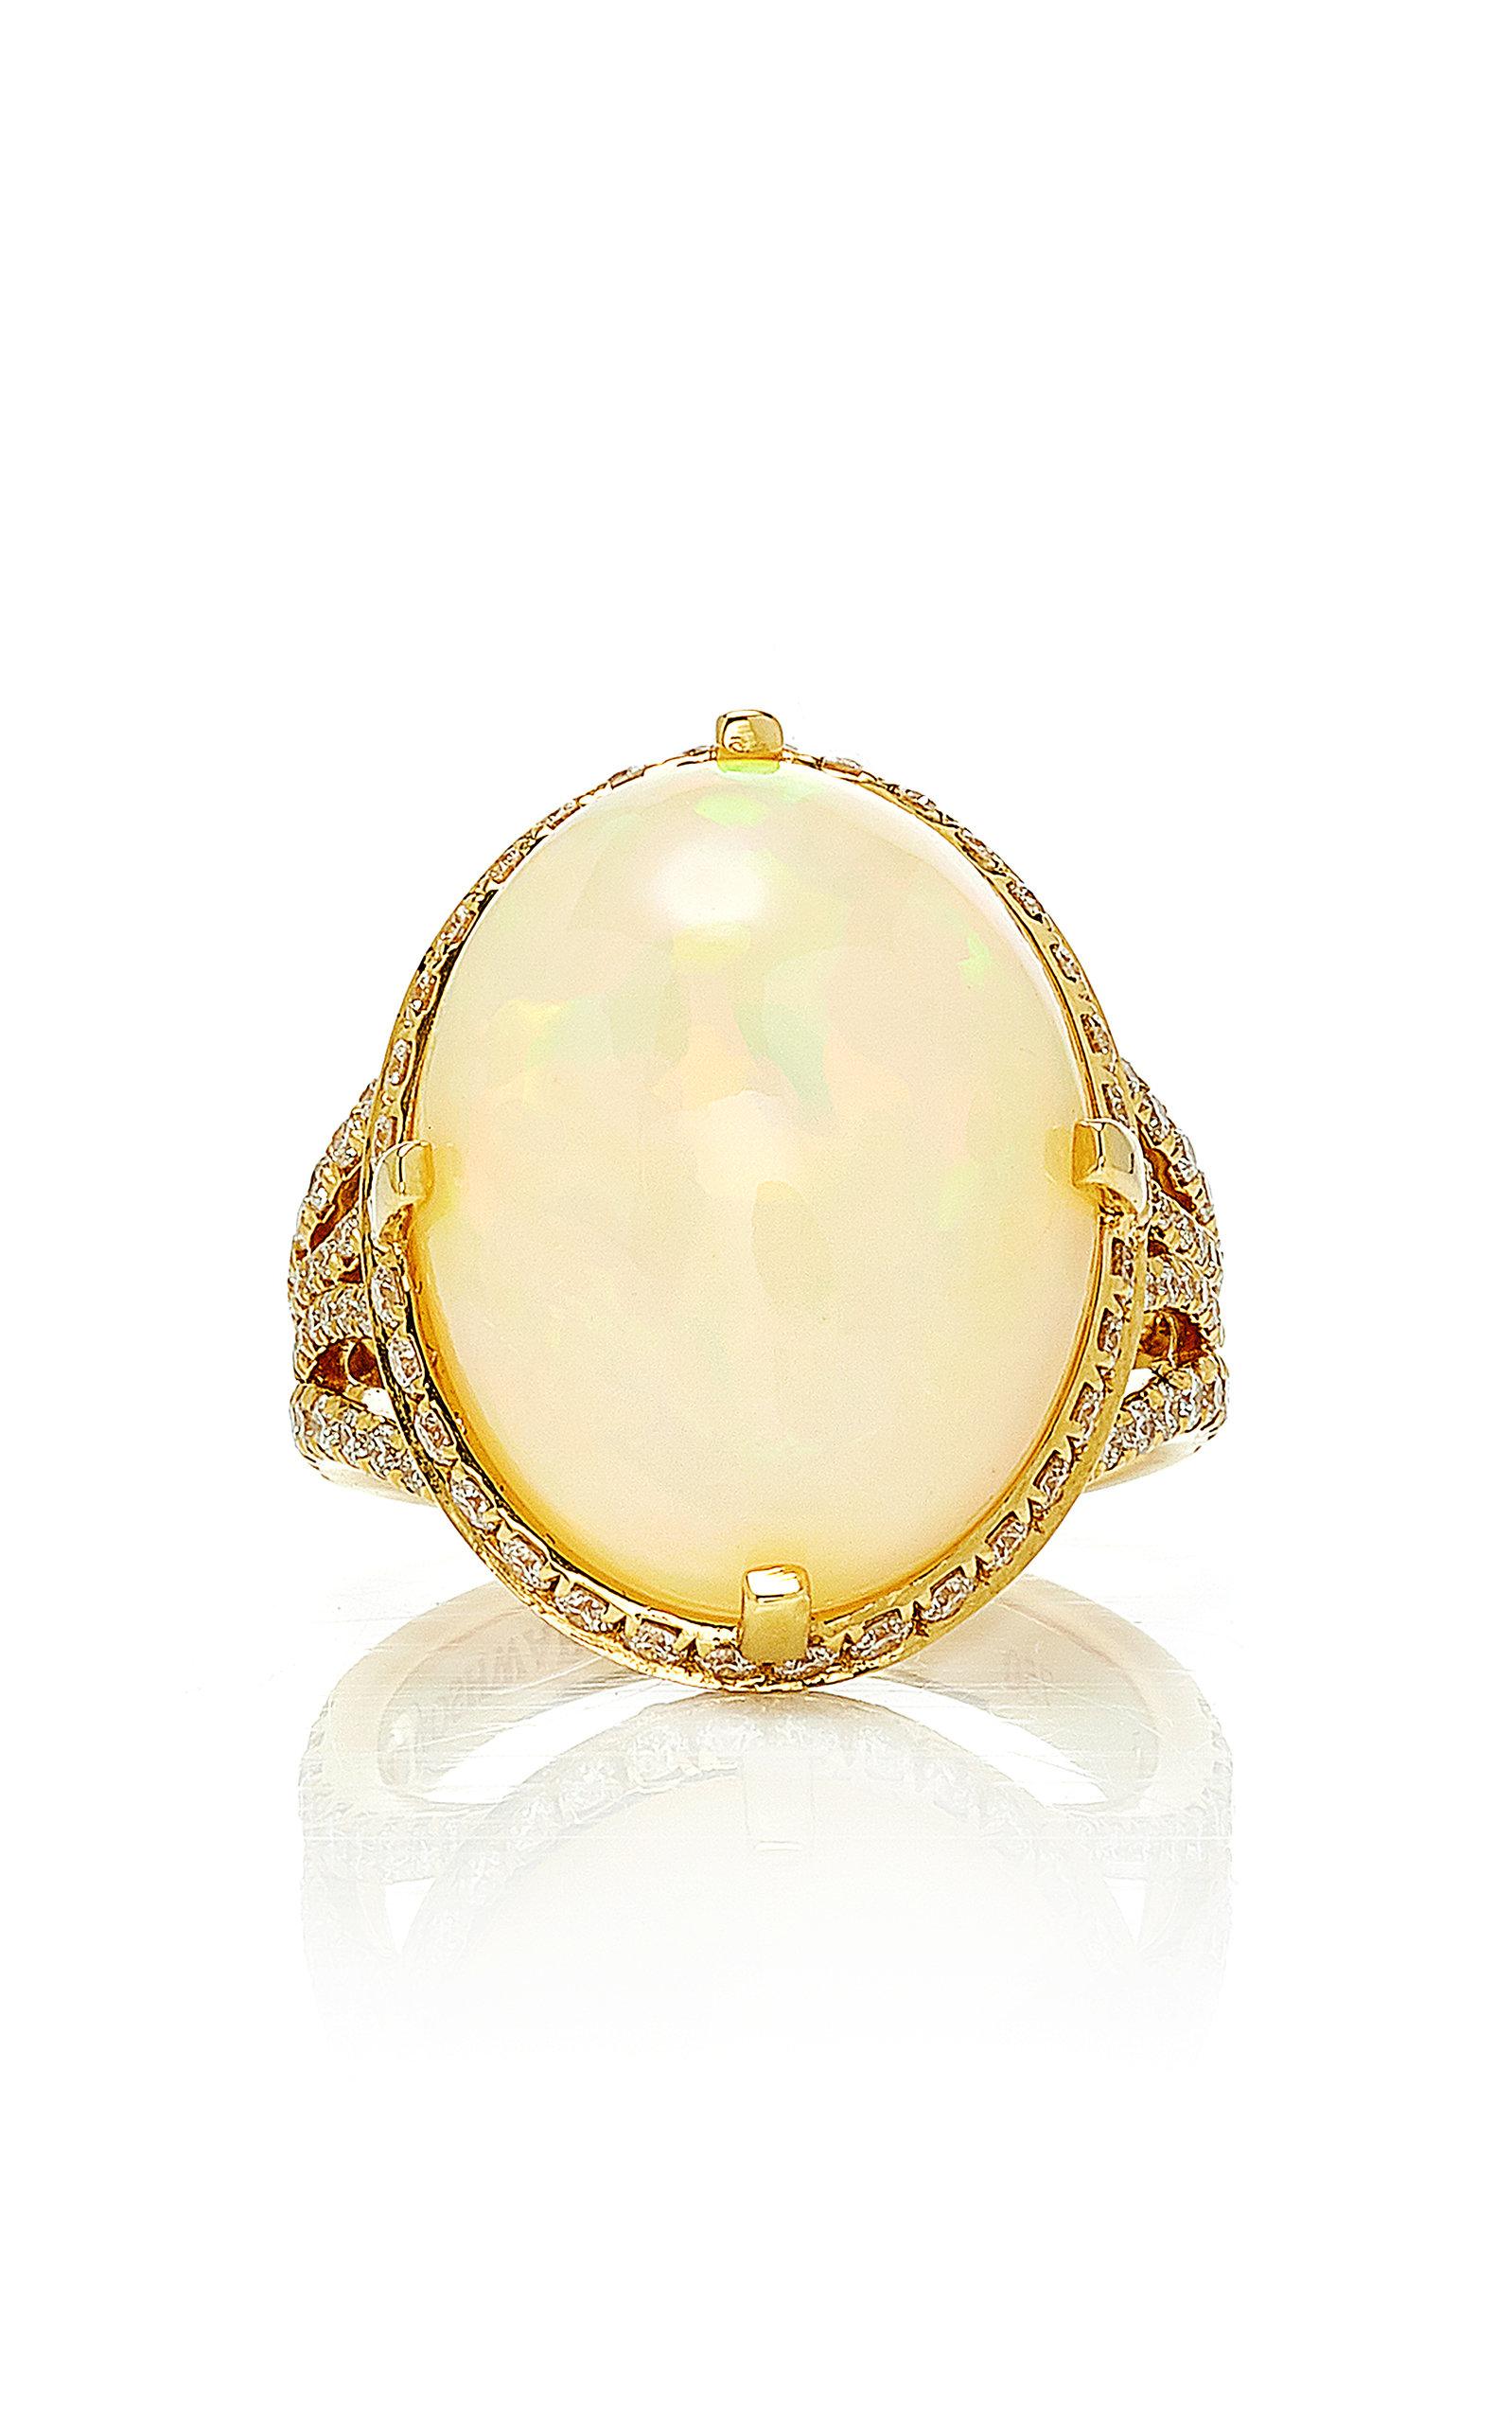 fcacf0d51 G-One 18K Yellow Gold, Opal and Diamond Ring by Goshwara   Moda Operandi